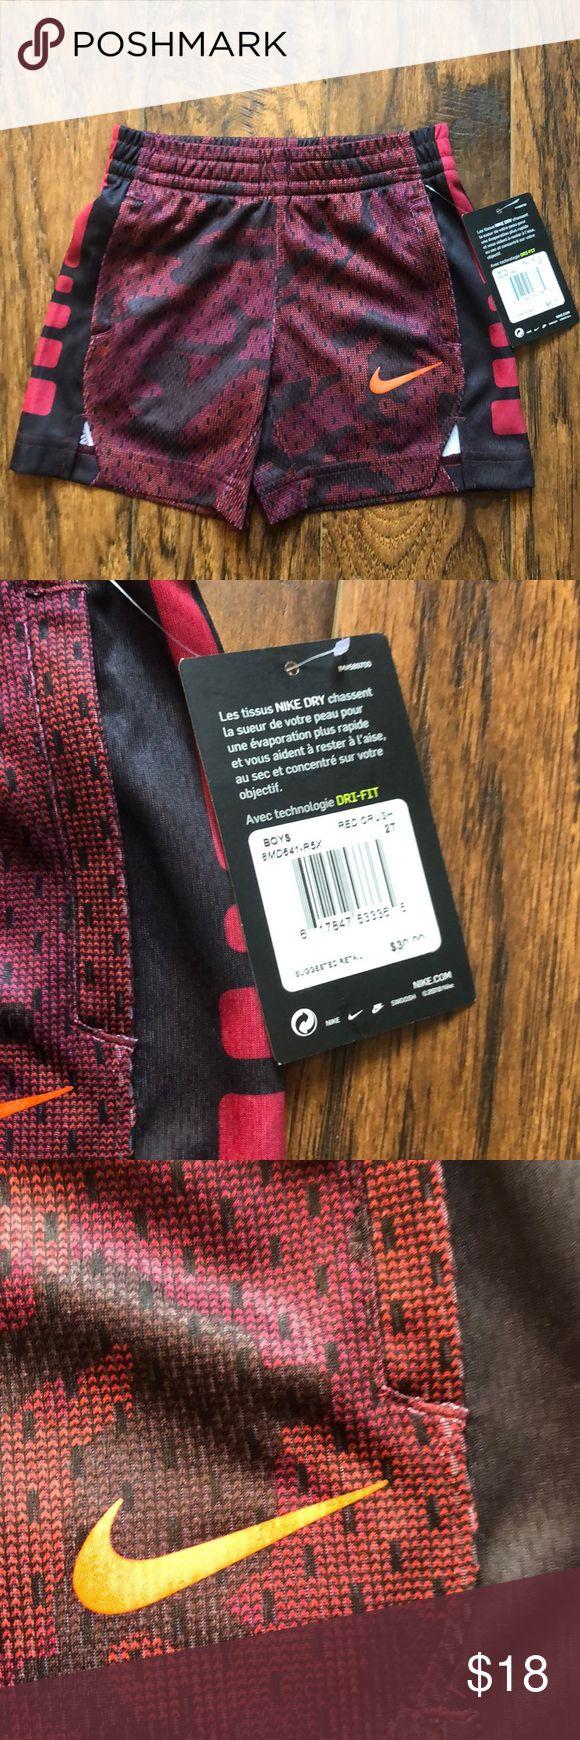 Neu mit Etiketten!! Nike Shorts NWT !! Jungen Nike Shirt, Rot Crush Camo Farben mit …   – My Posh Picks